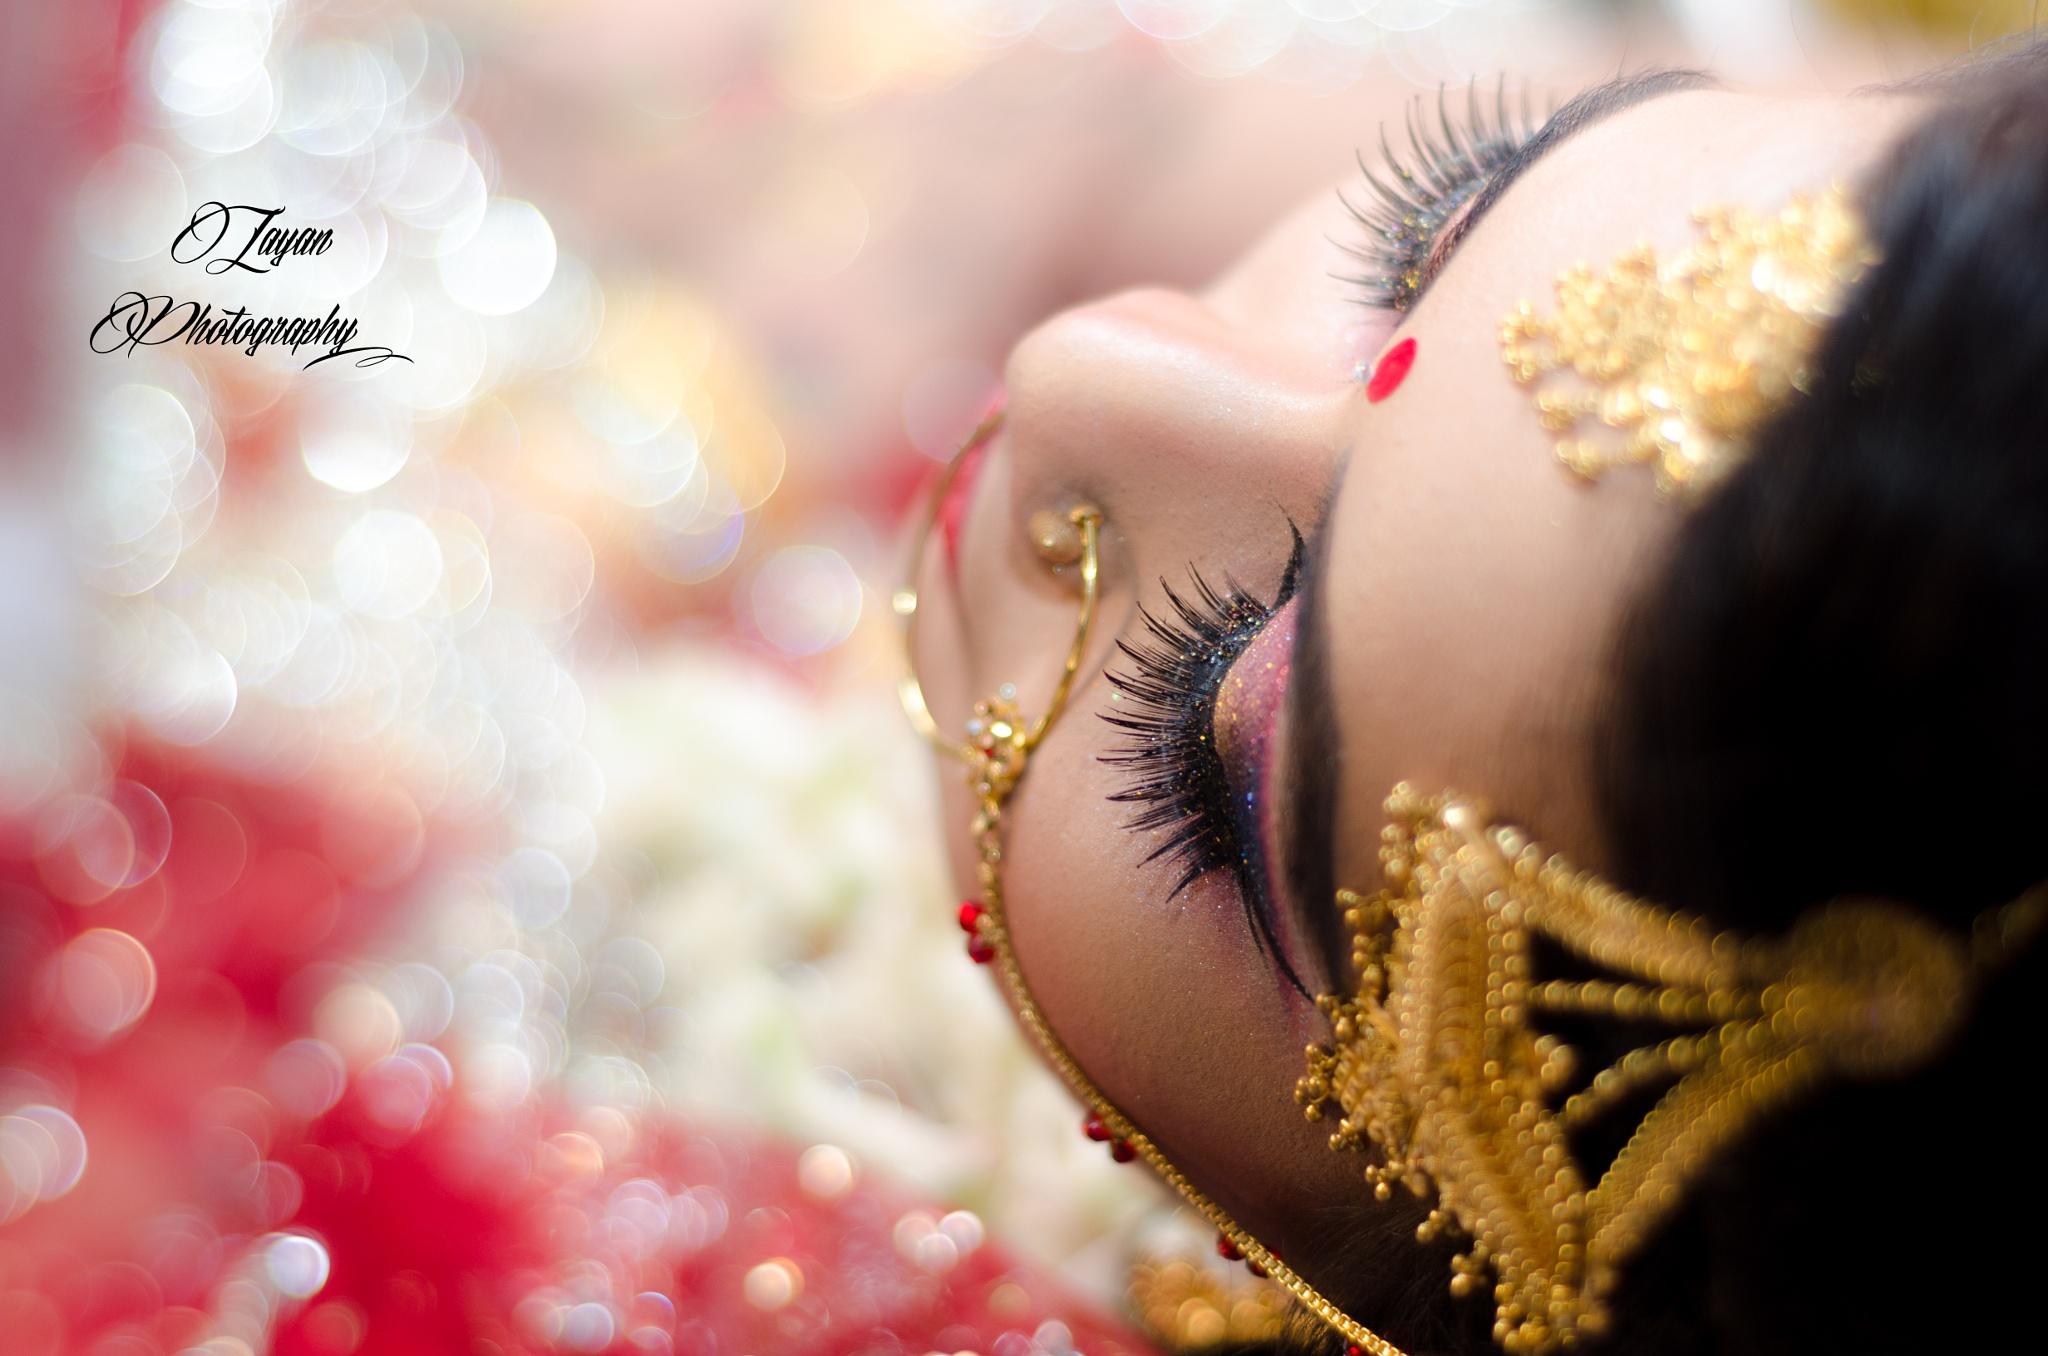 glitering bride by Rezaur Ruddro